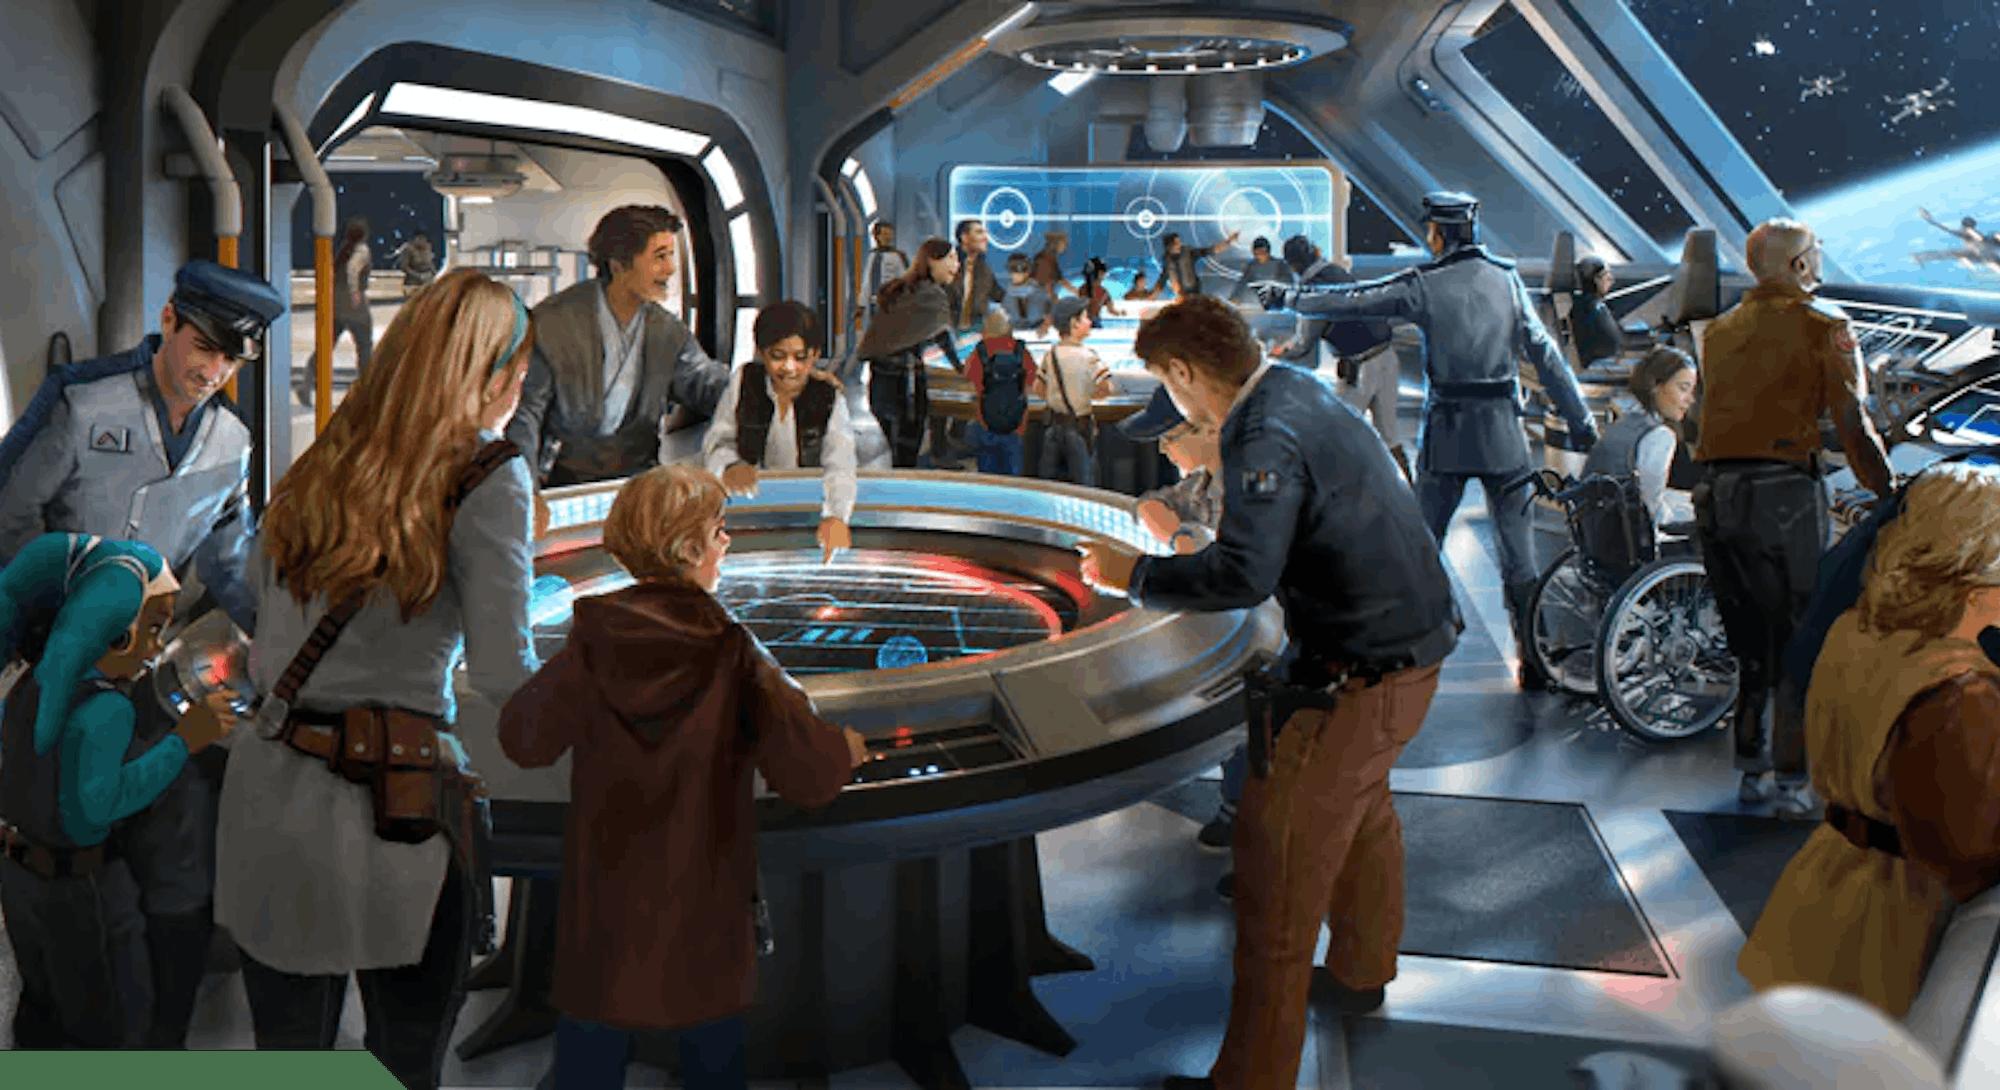 concept art of spaceship bridge from Star Wars: Galactic Starcruiser